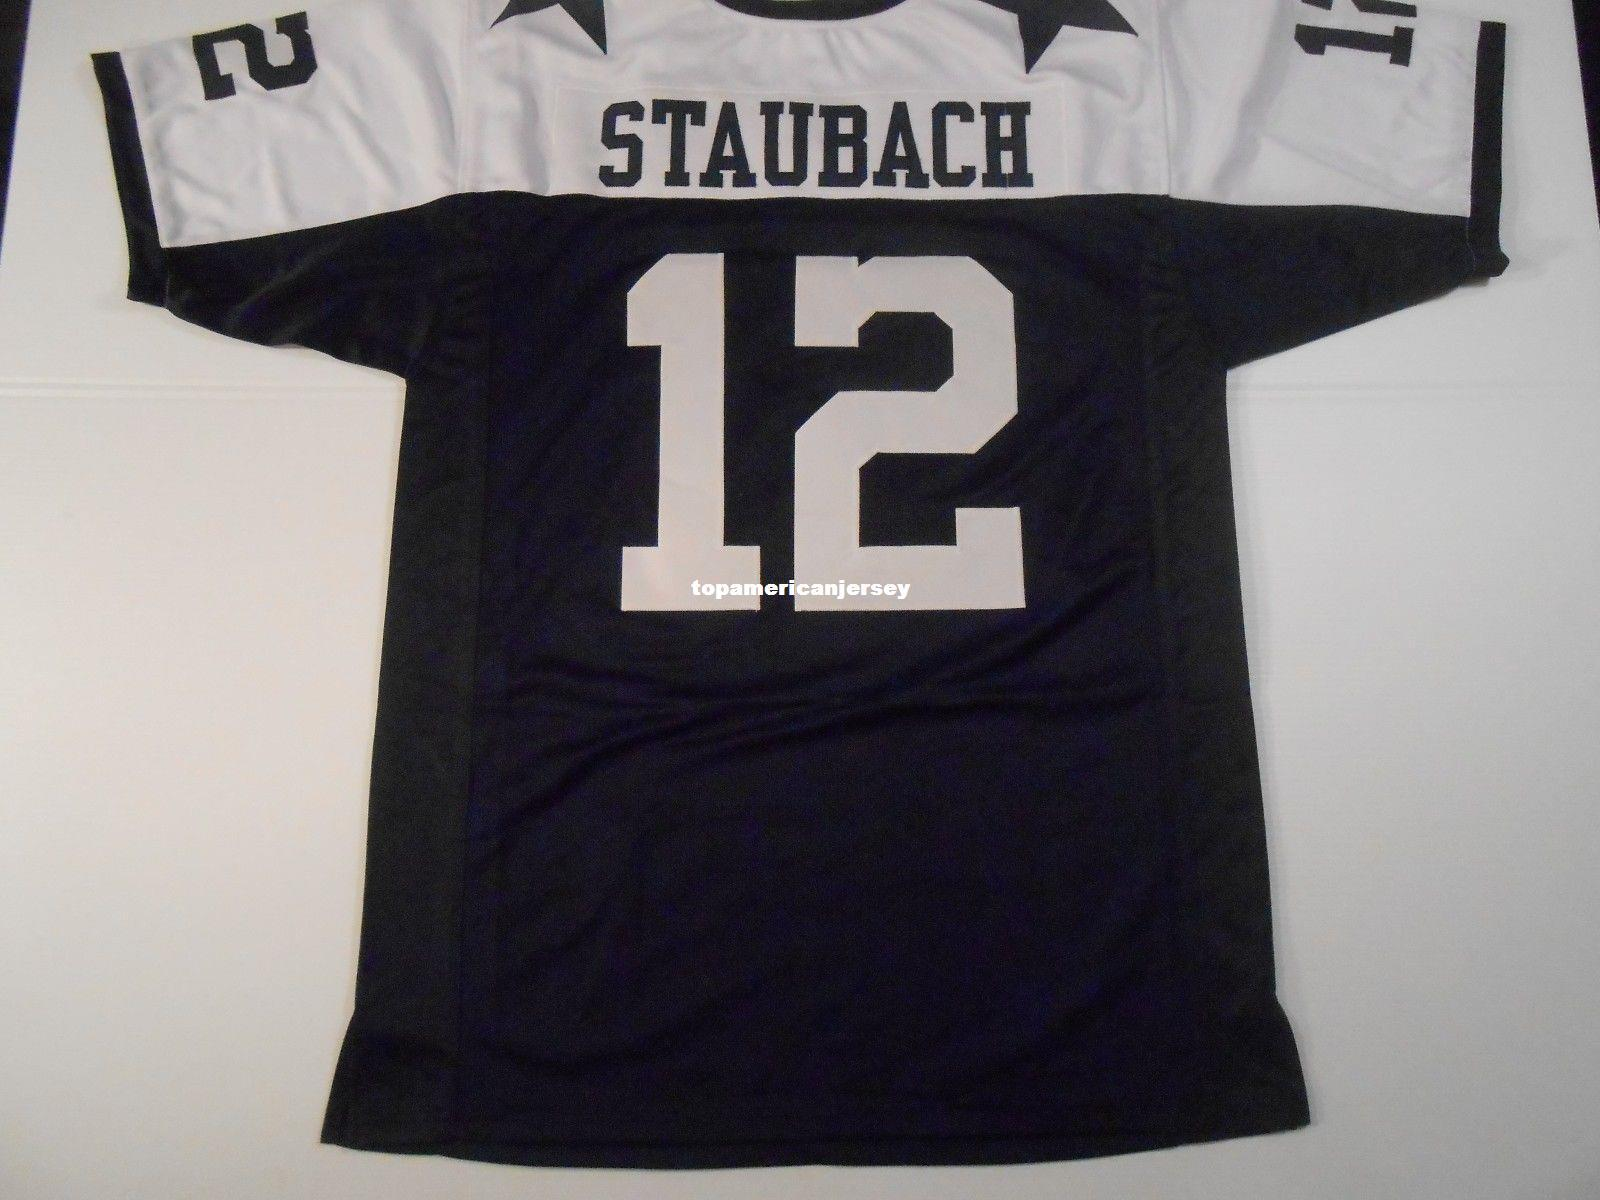 buy popular 6907b 31b69 Cheap Retro custom Sewn Stitched #12 Roger Staubach MITCHELL & NESS Jersey  Top S-5XL,6XL Men's Football Jerseys Rugby